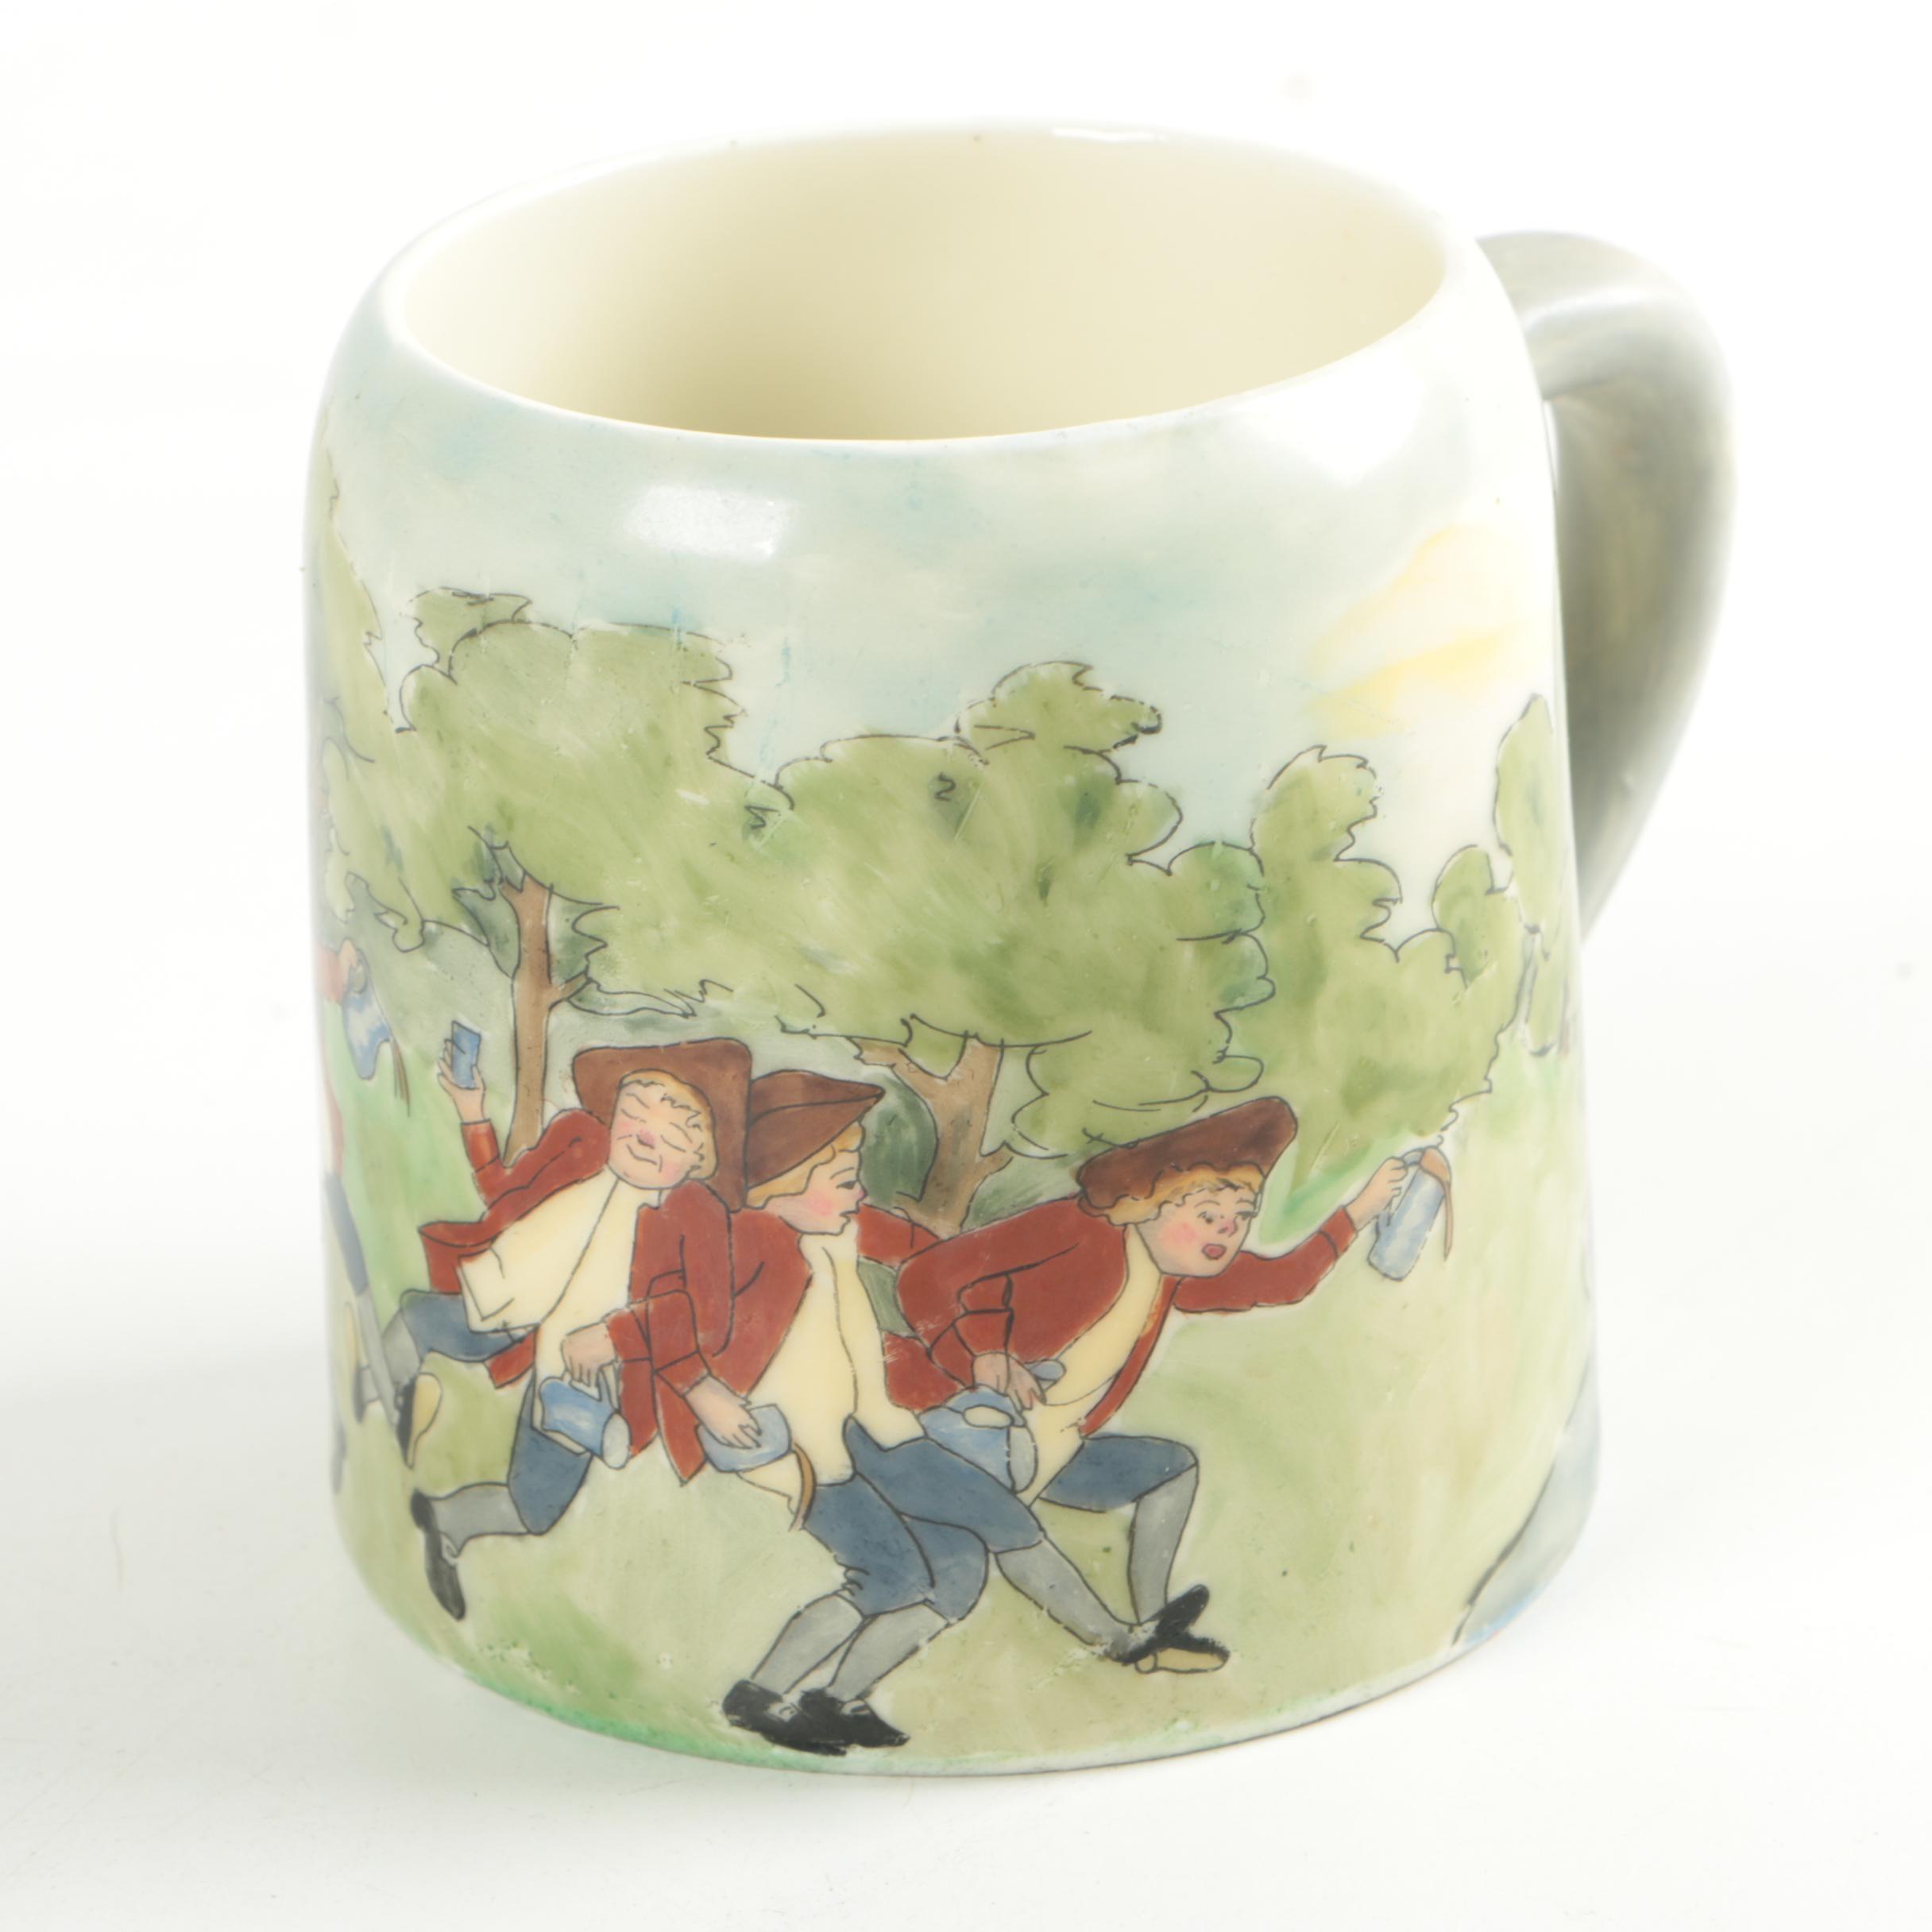 1914 Hand-Painted Satire Mug Signed K. Stewart